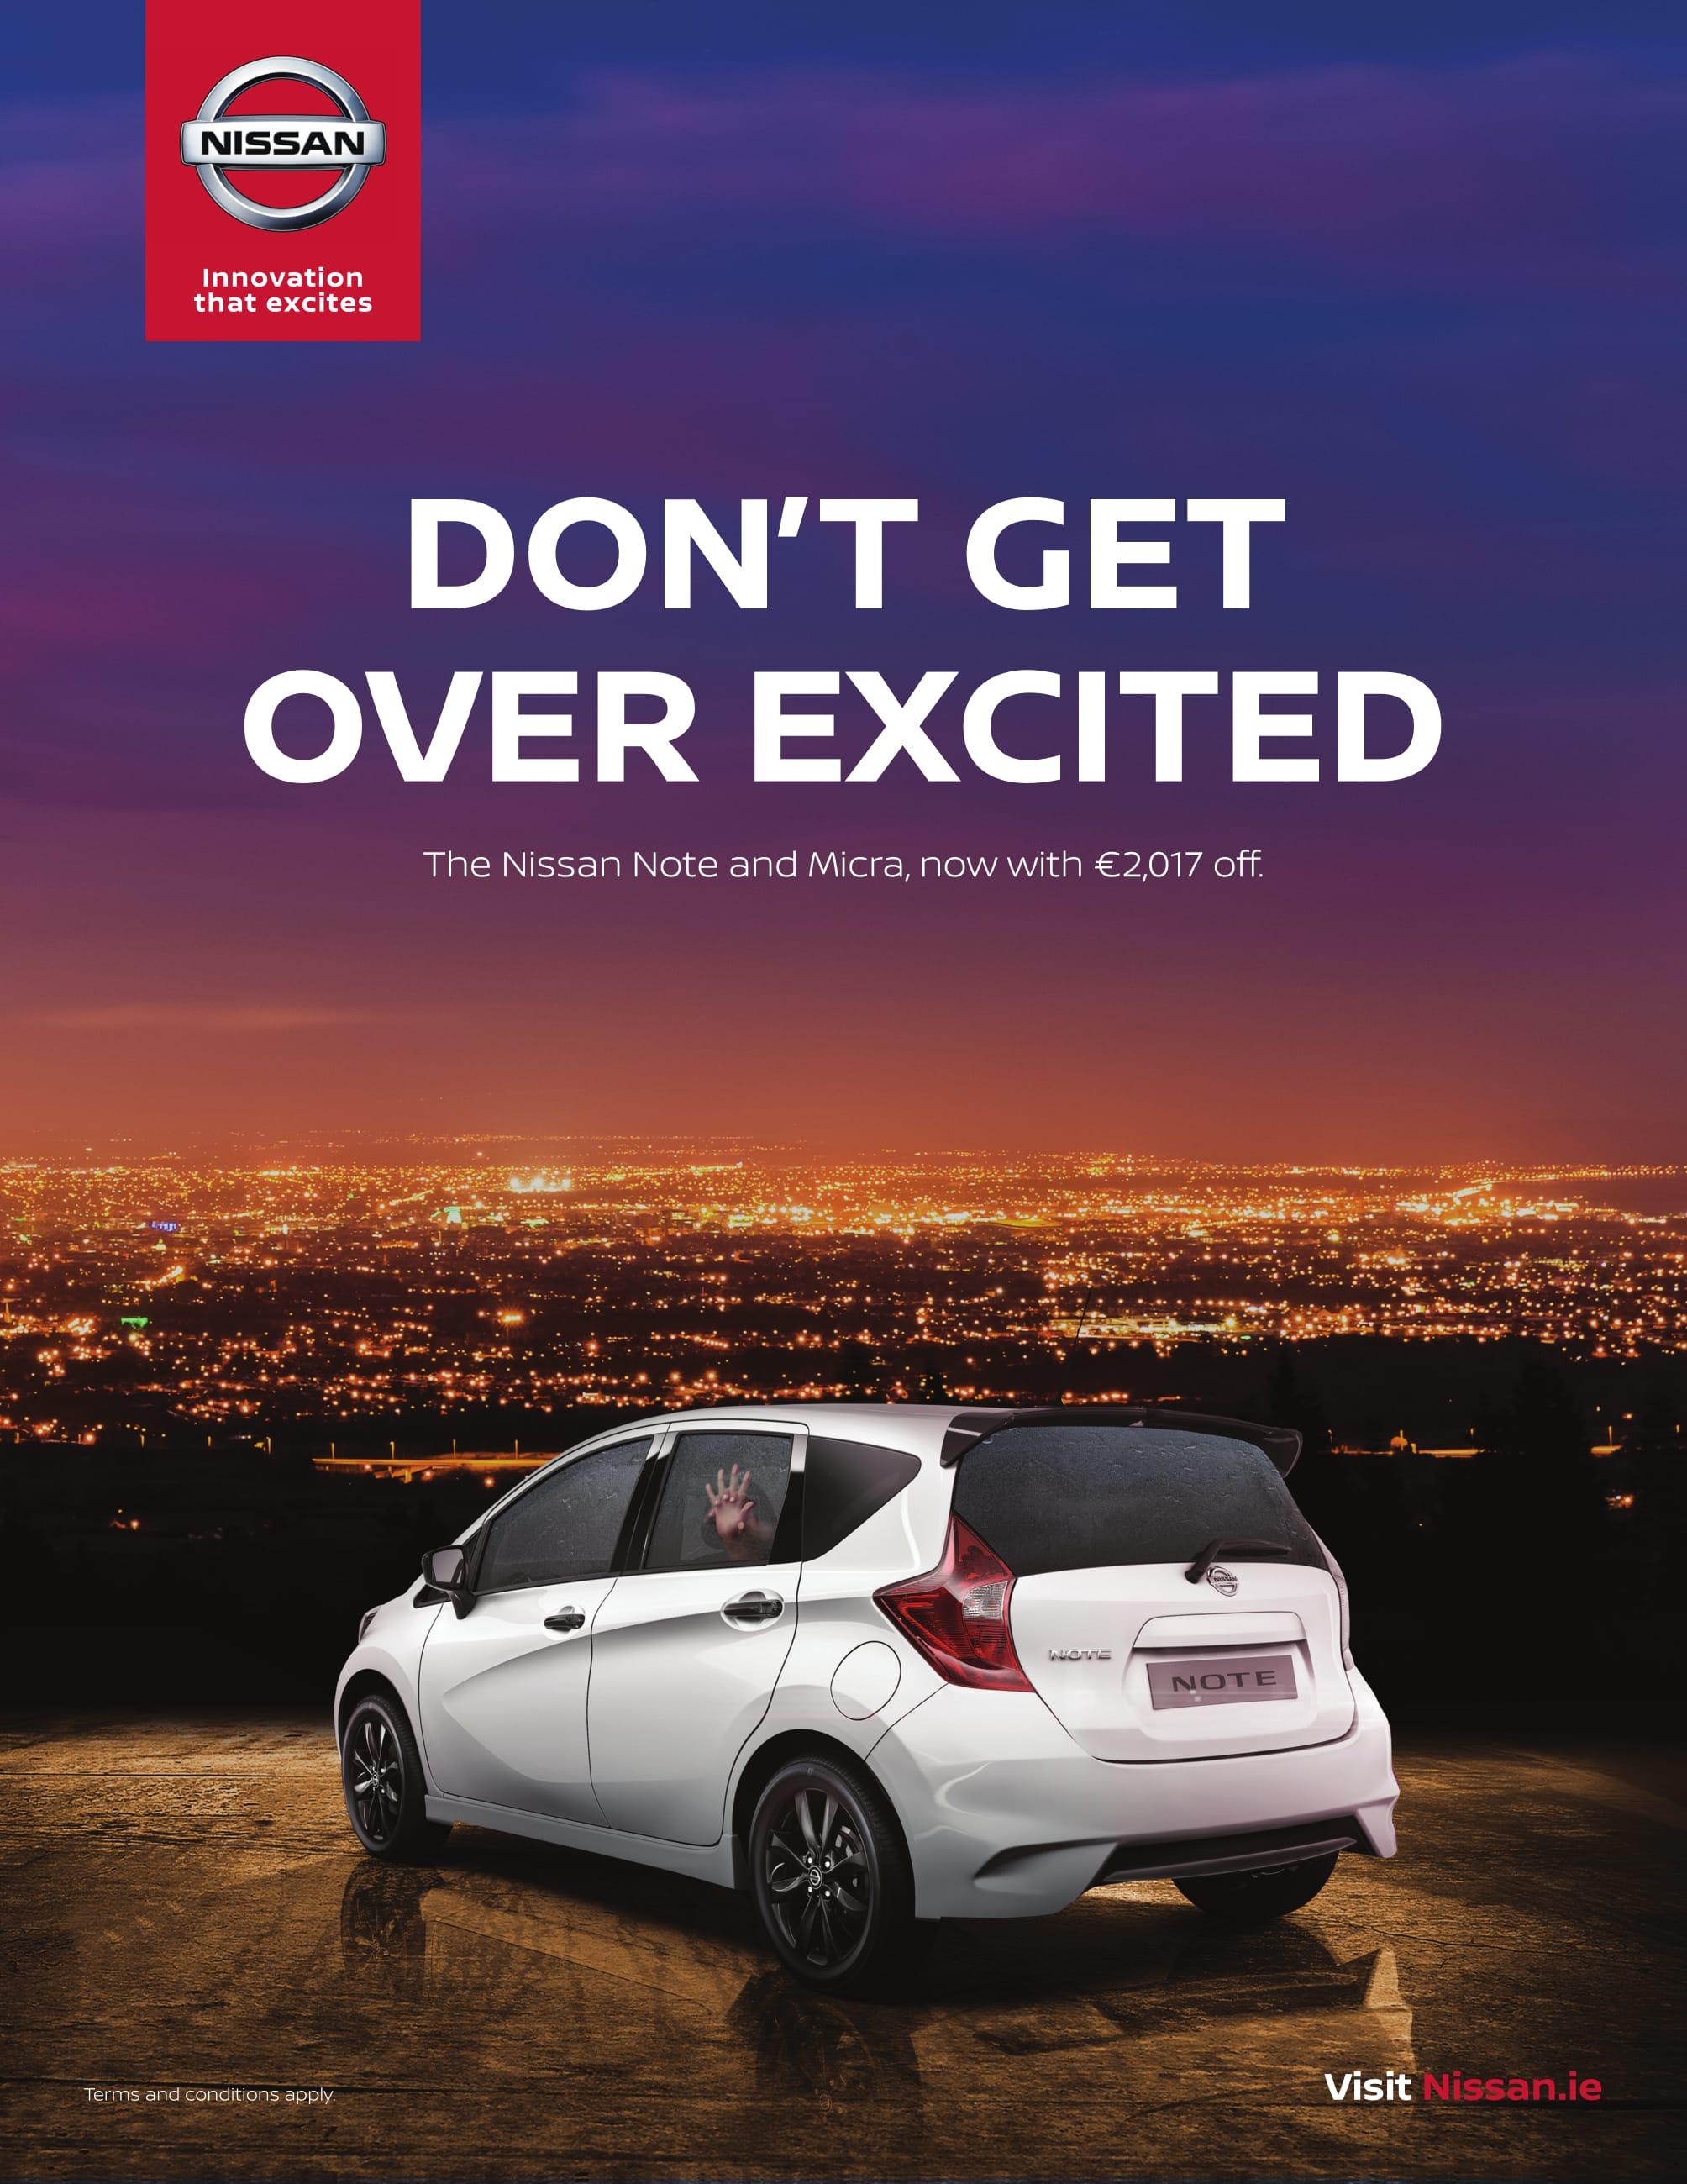 Nissan Ireland In The Company of Huskies AdWorld.ie